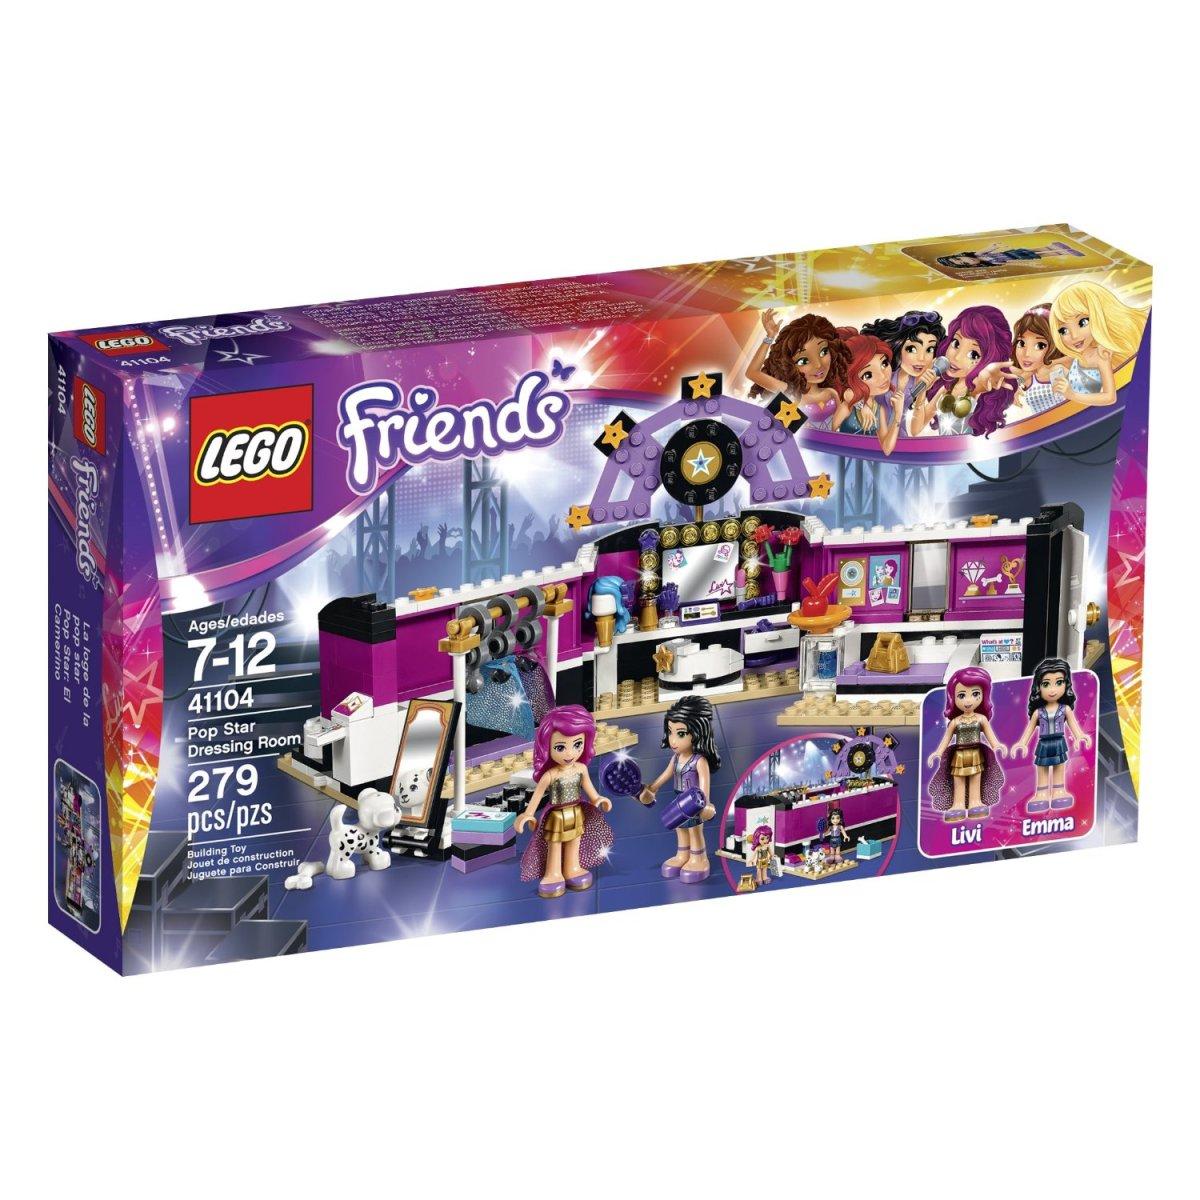 Amazon Deal: Lego Friends 41104- Pop Star DressingRoom